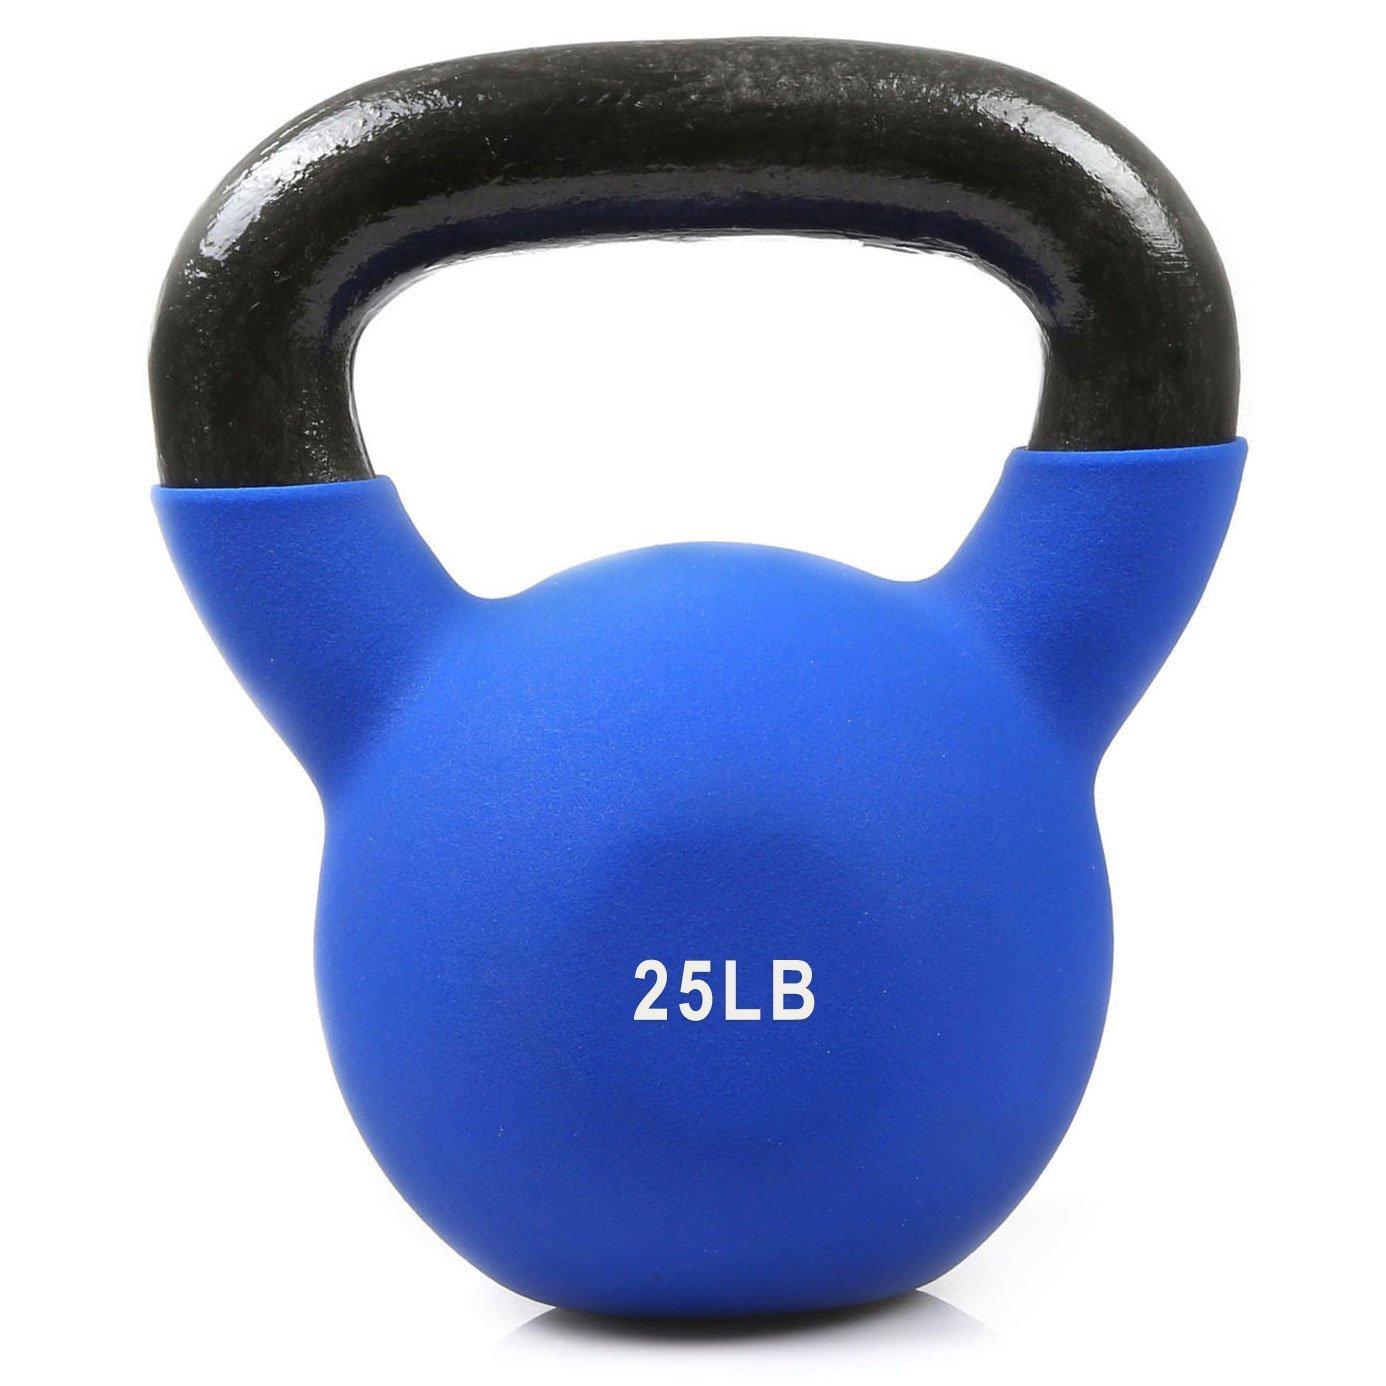 RitFitビニールコーティングソリッド鋳鉄ケトルベルのフルボディワークアウト、重量損失&強度トレーニング( with LBマーキング)  25LB(Dark Blue New) B079KY86Z6